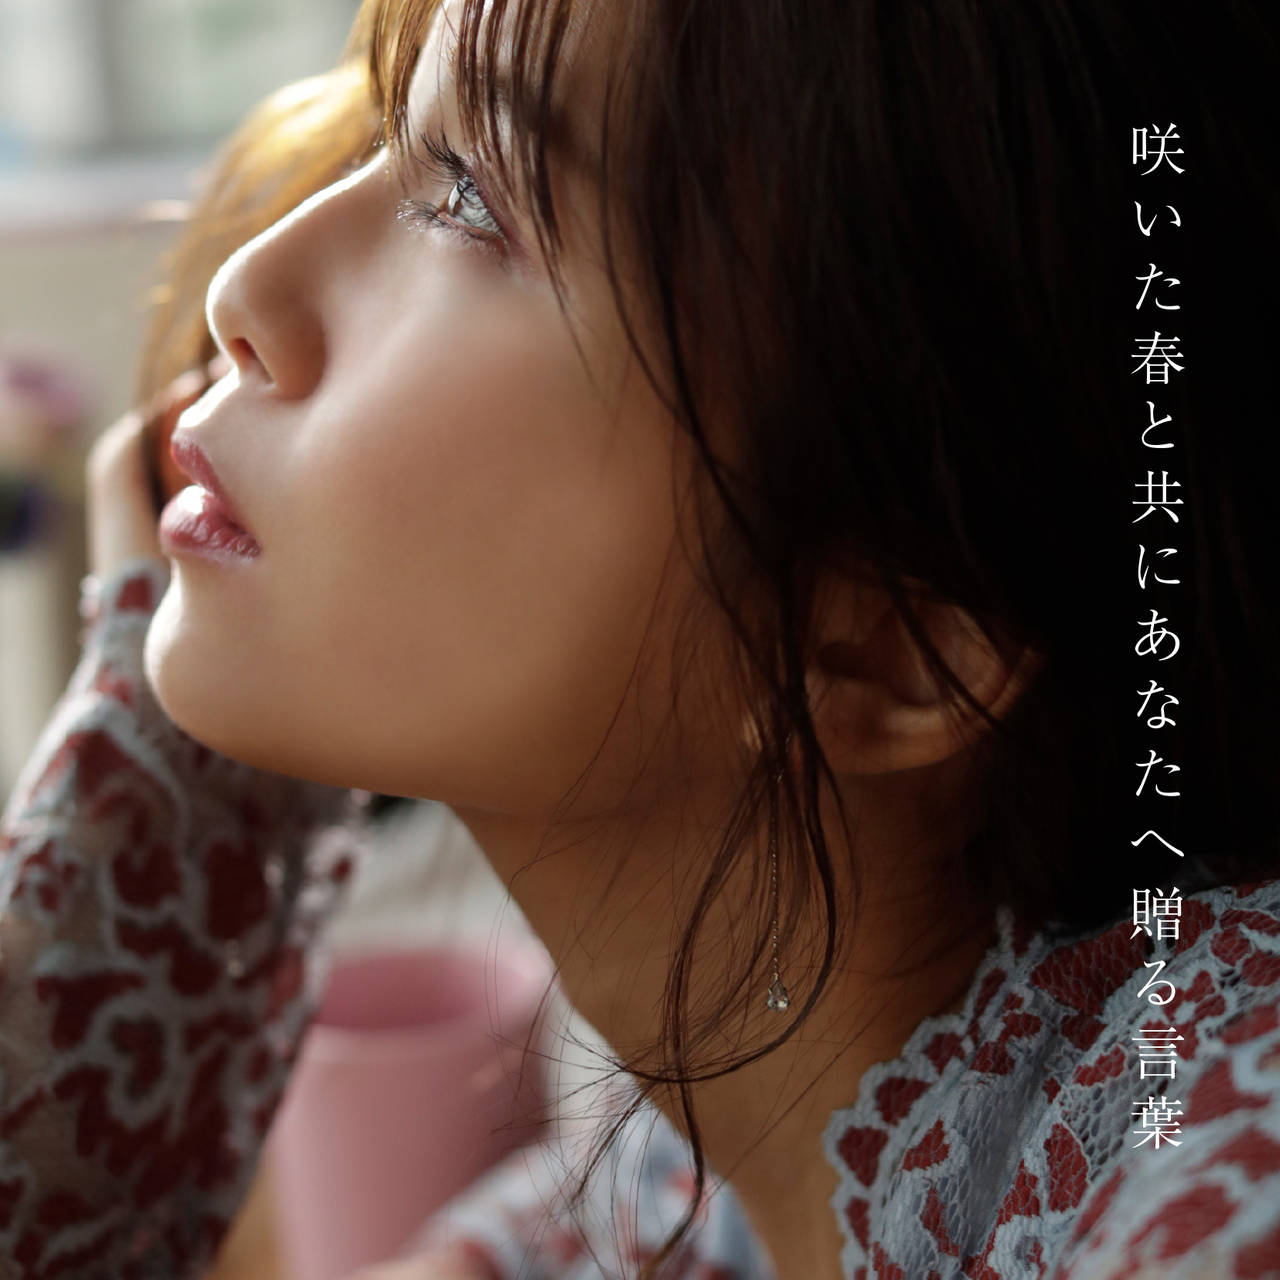 宇野実彩子主演「JAL浪漫旅行2019」 WEBムービー解禁